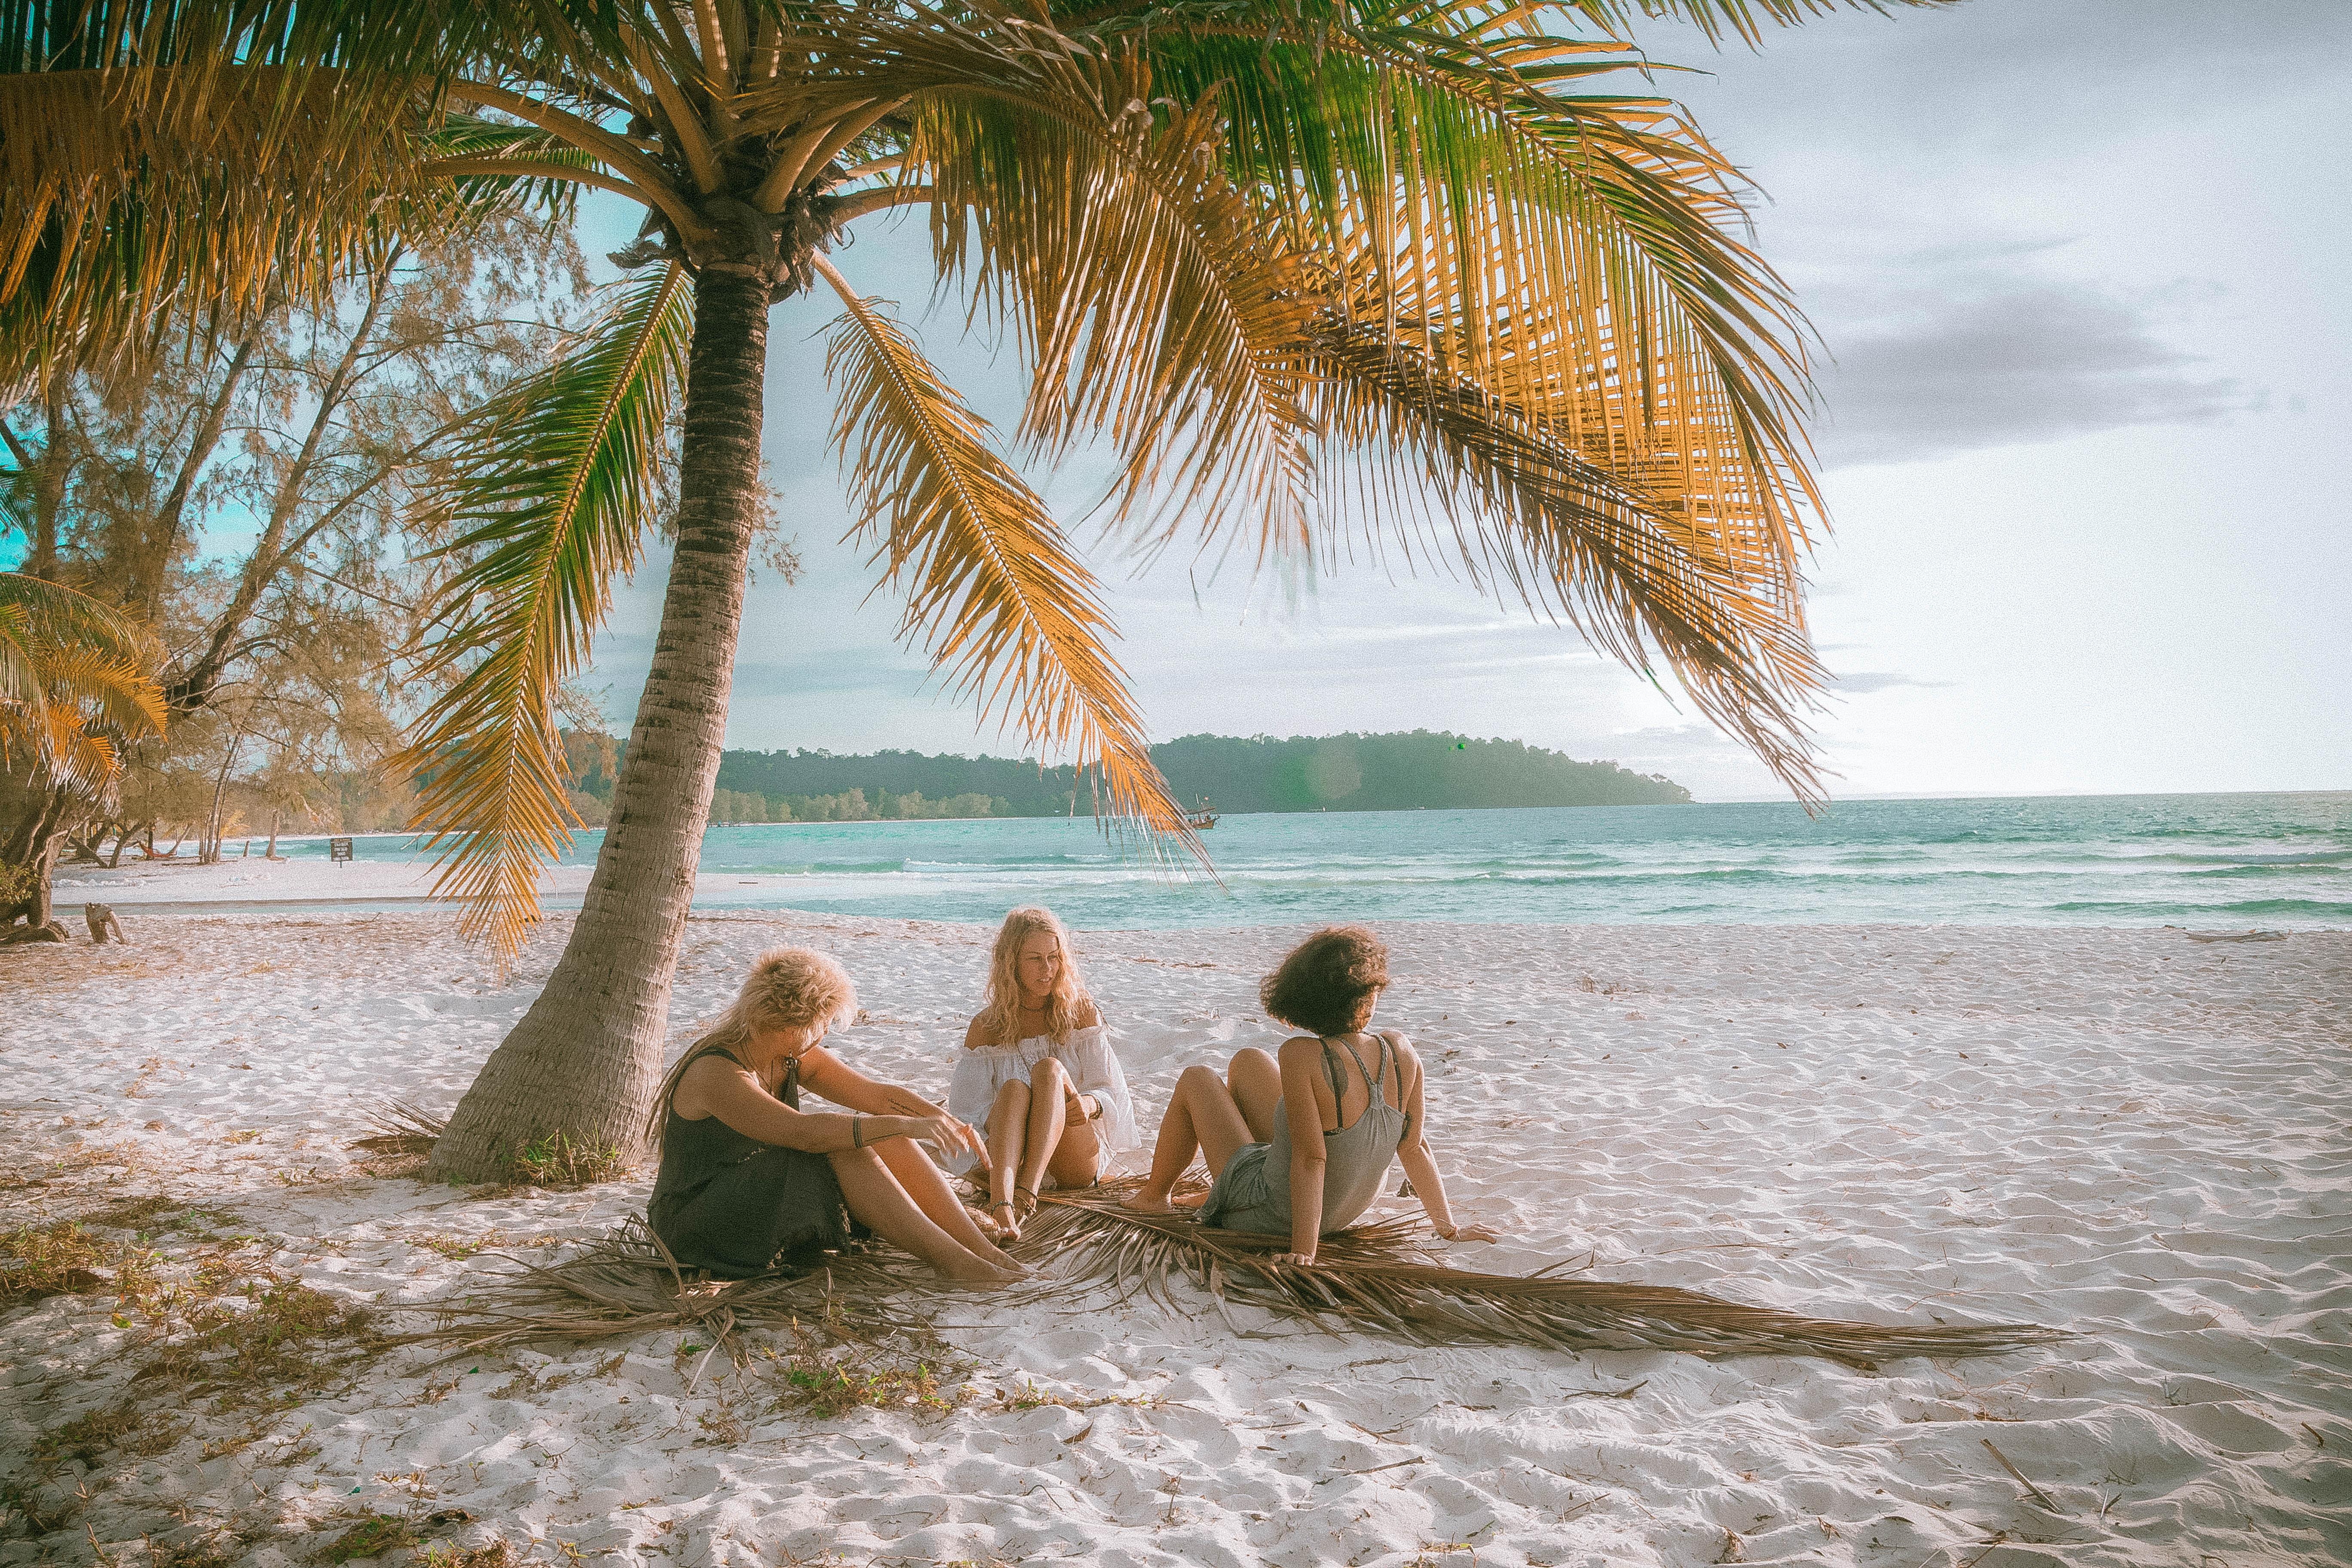 chilling on the white beach in kk beach koh rong island cambodia